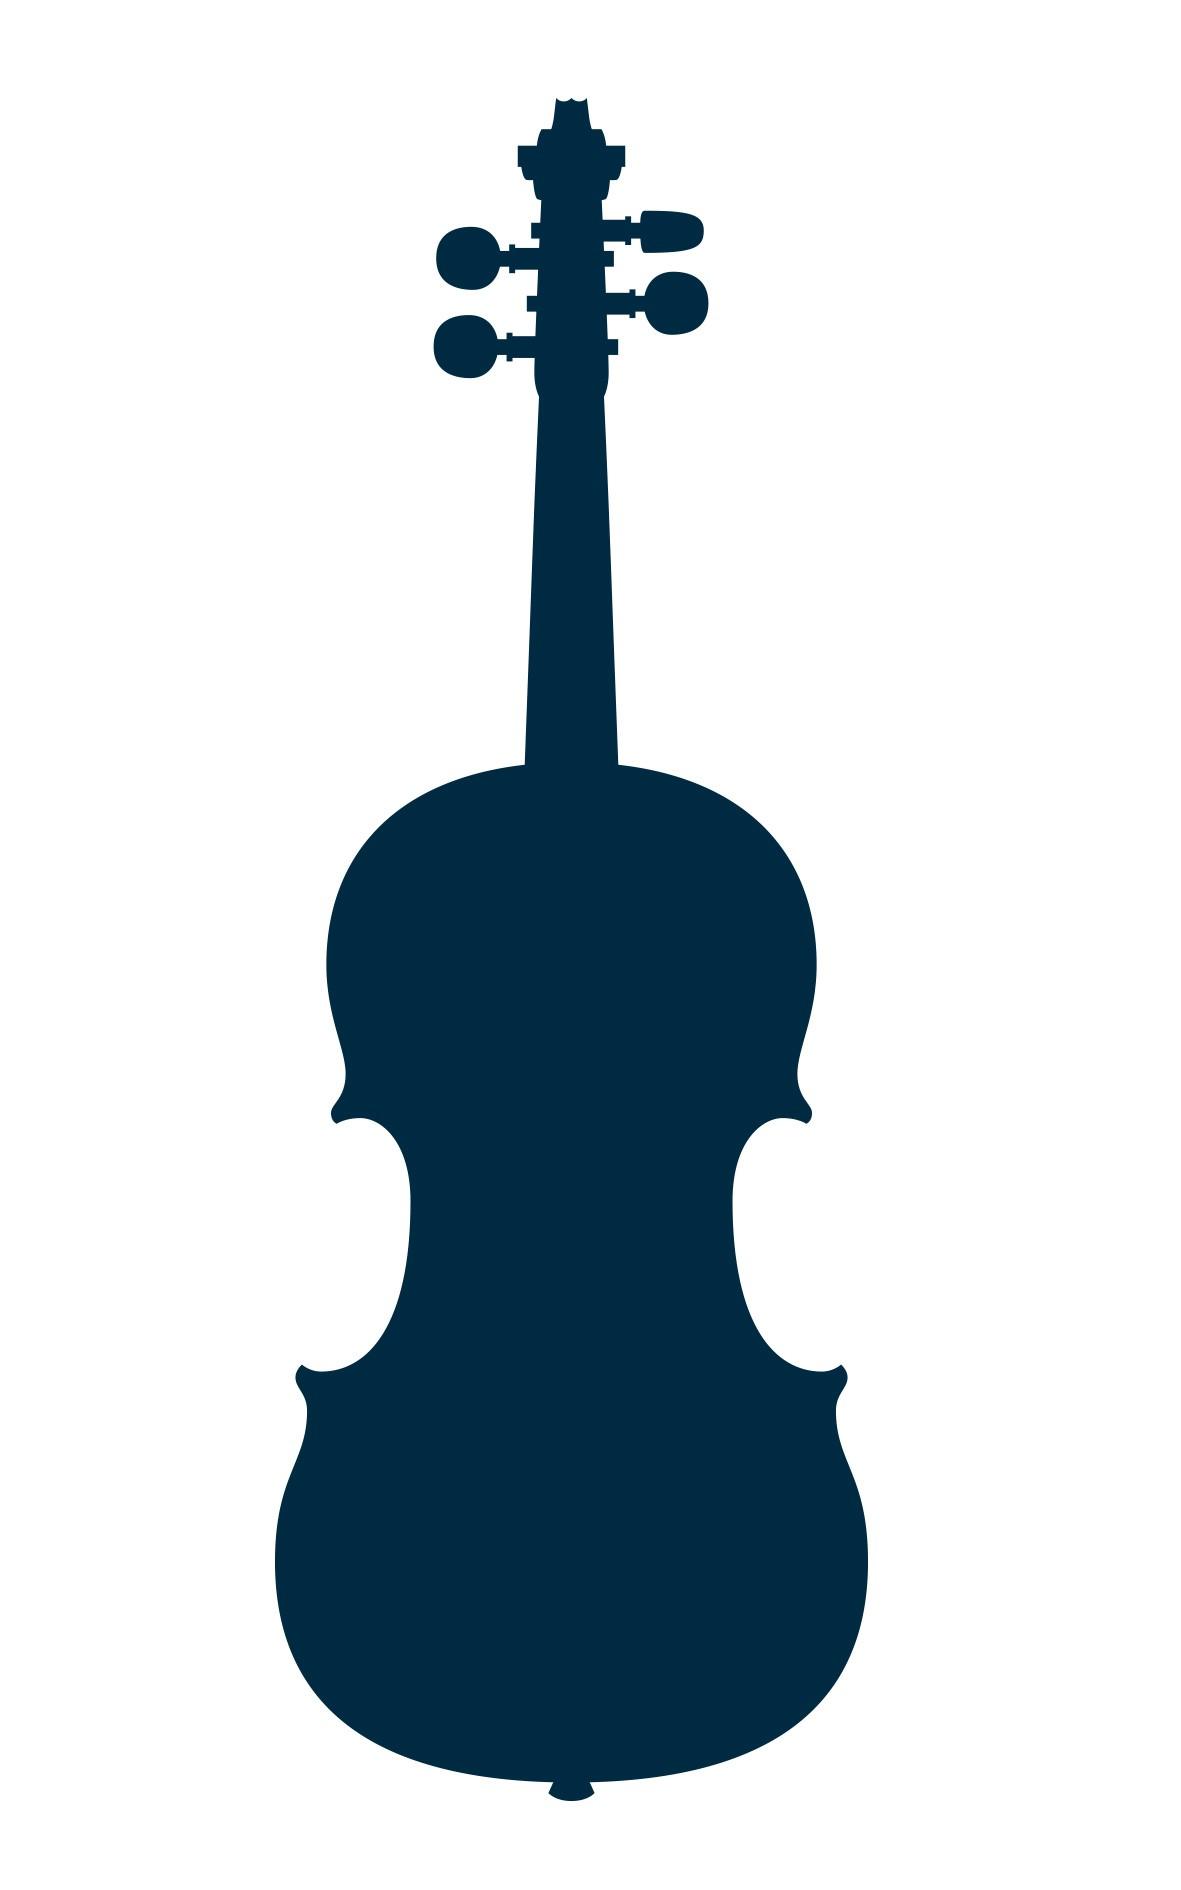 Violin by G. Robert Pfretzschner